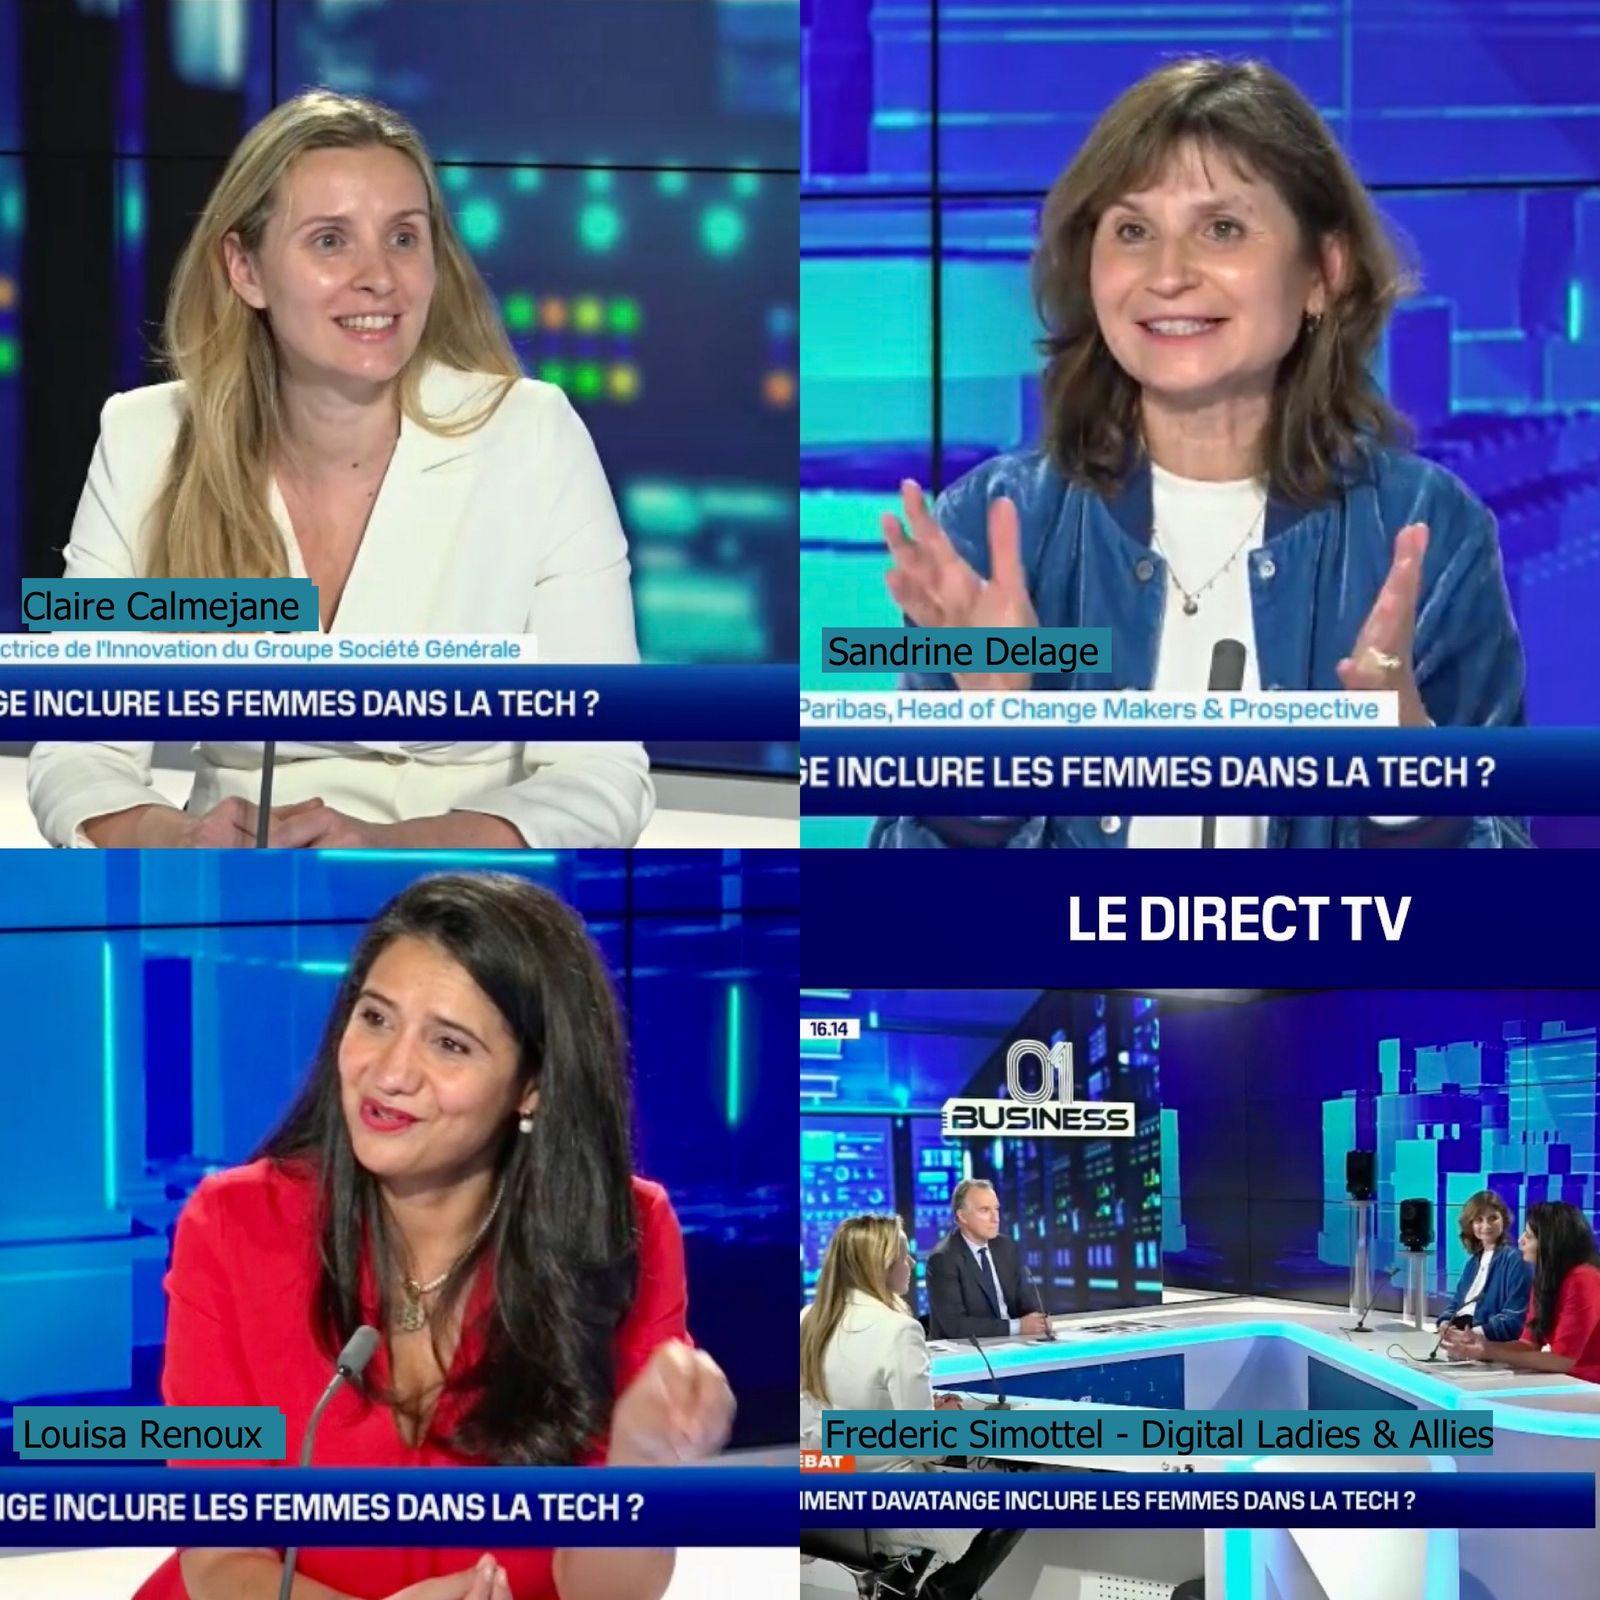 #WomenIntech Sandrine Delage - Digital Ladies & Allies - BFMBusiness - Fédéric Simottel